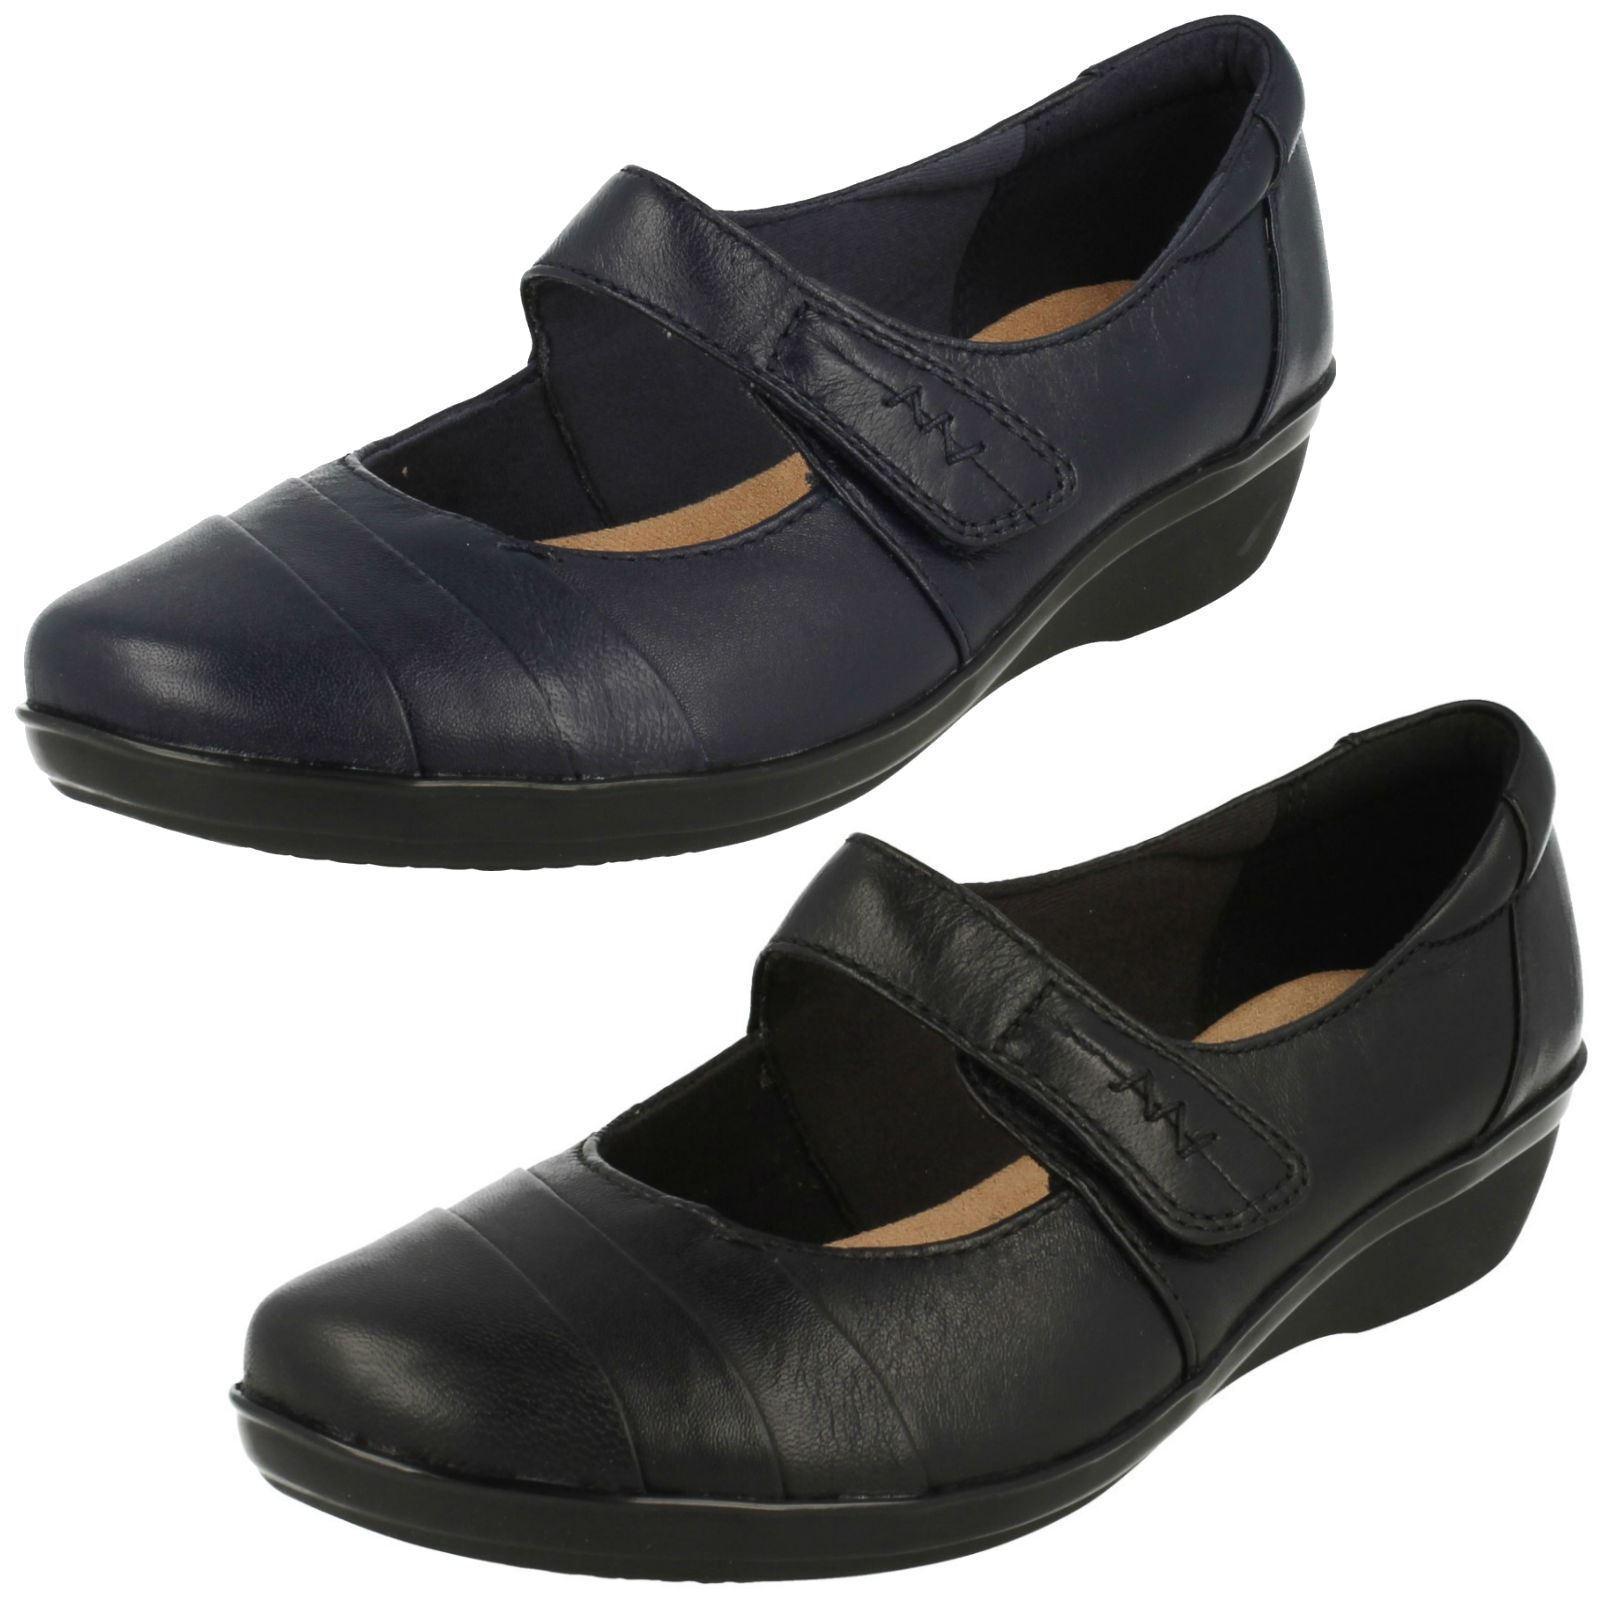 Femmes Clarks Coussin Doux Smart Chaussures  everlay Kennon